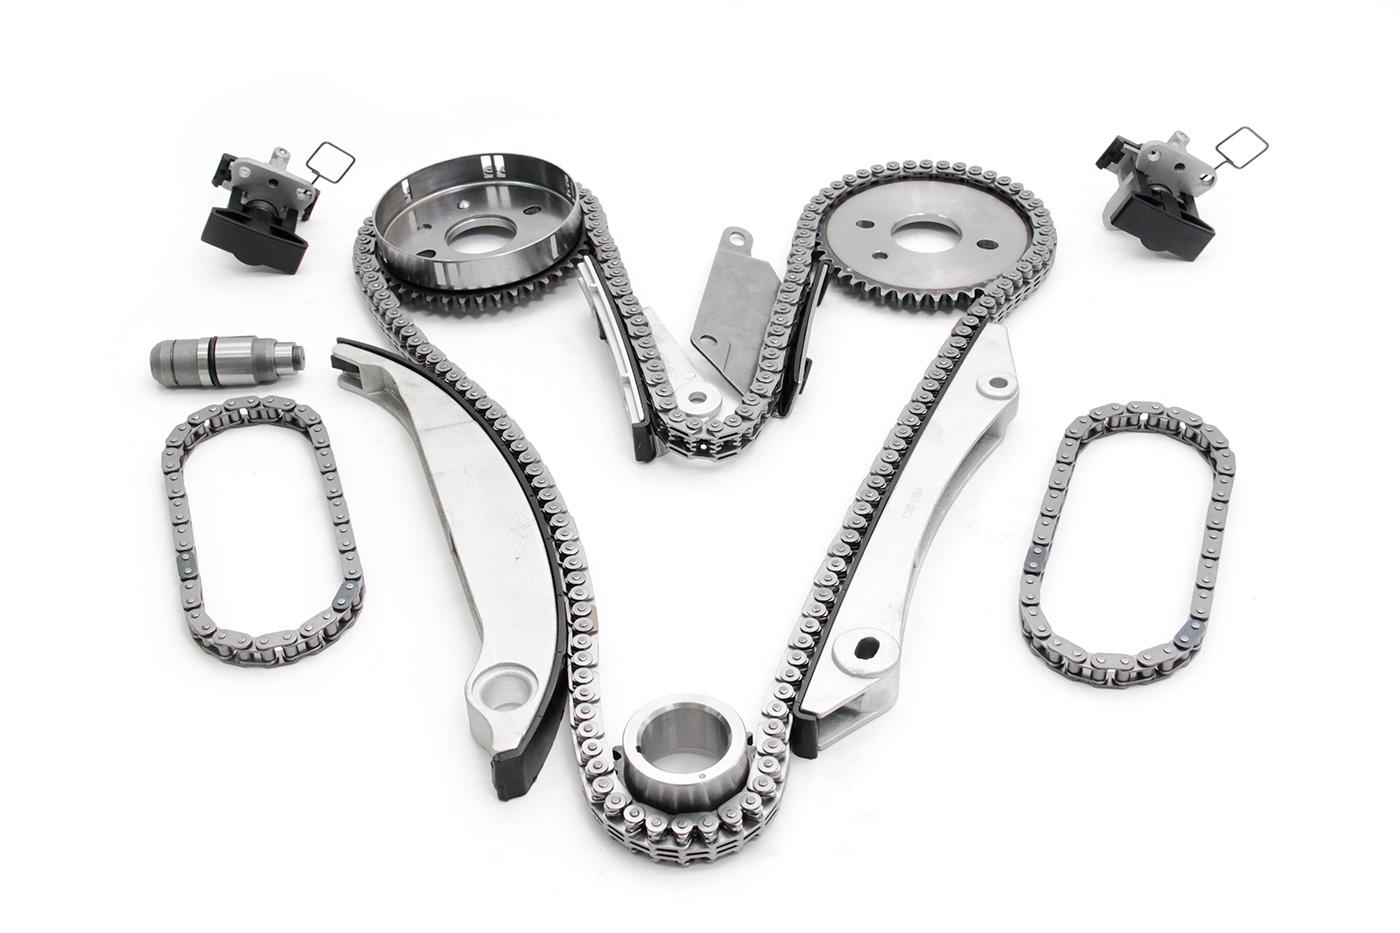 Timing Chain Kit Chrysler, Concorde, Stratus, Sebring